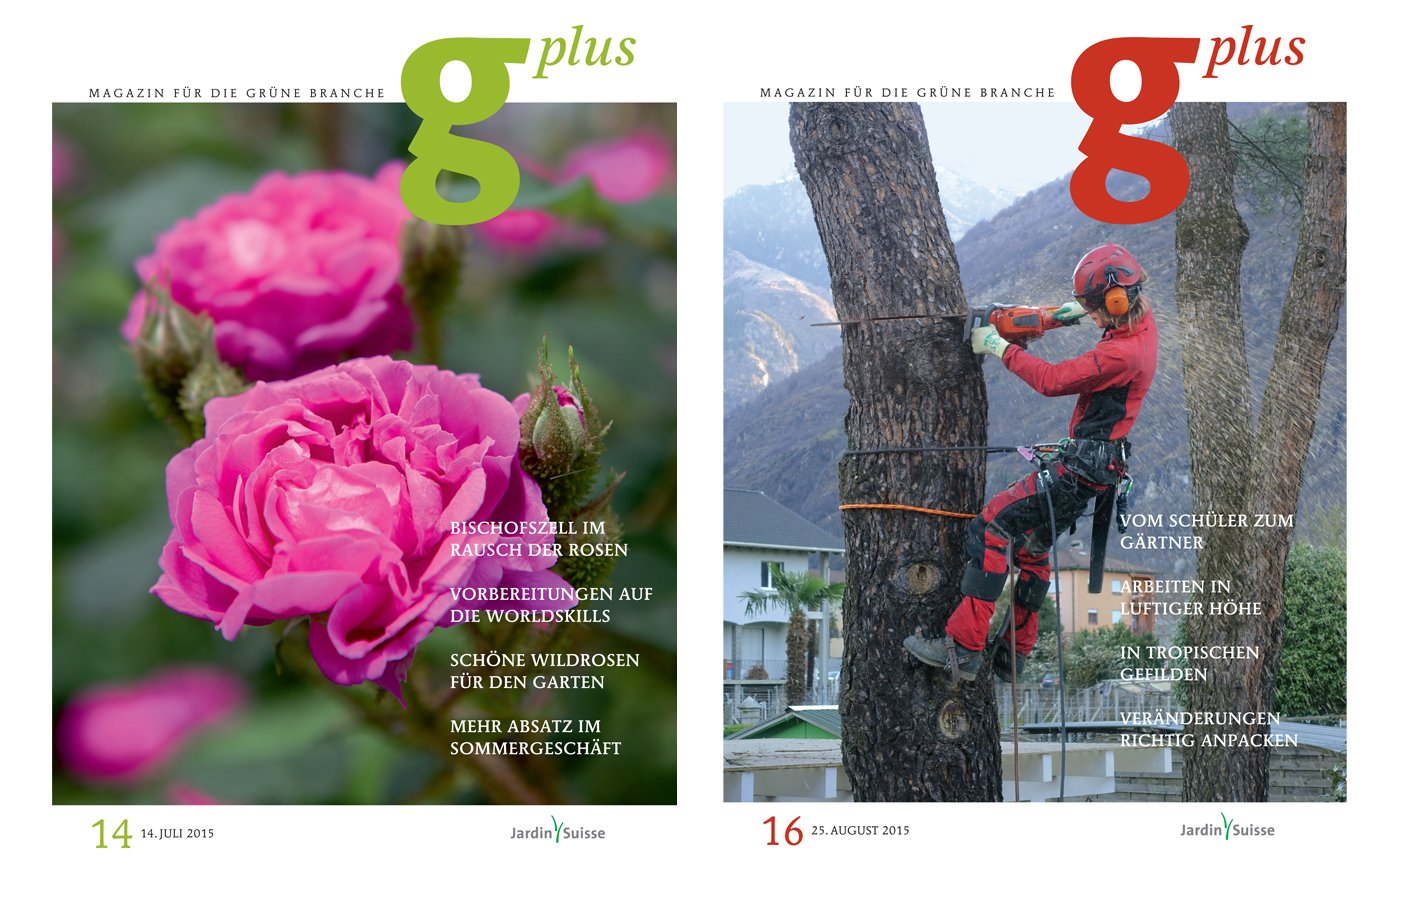 gplus cover 3.jpg